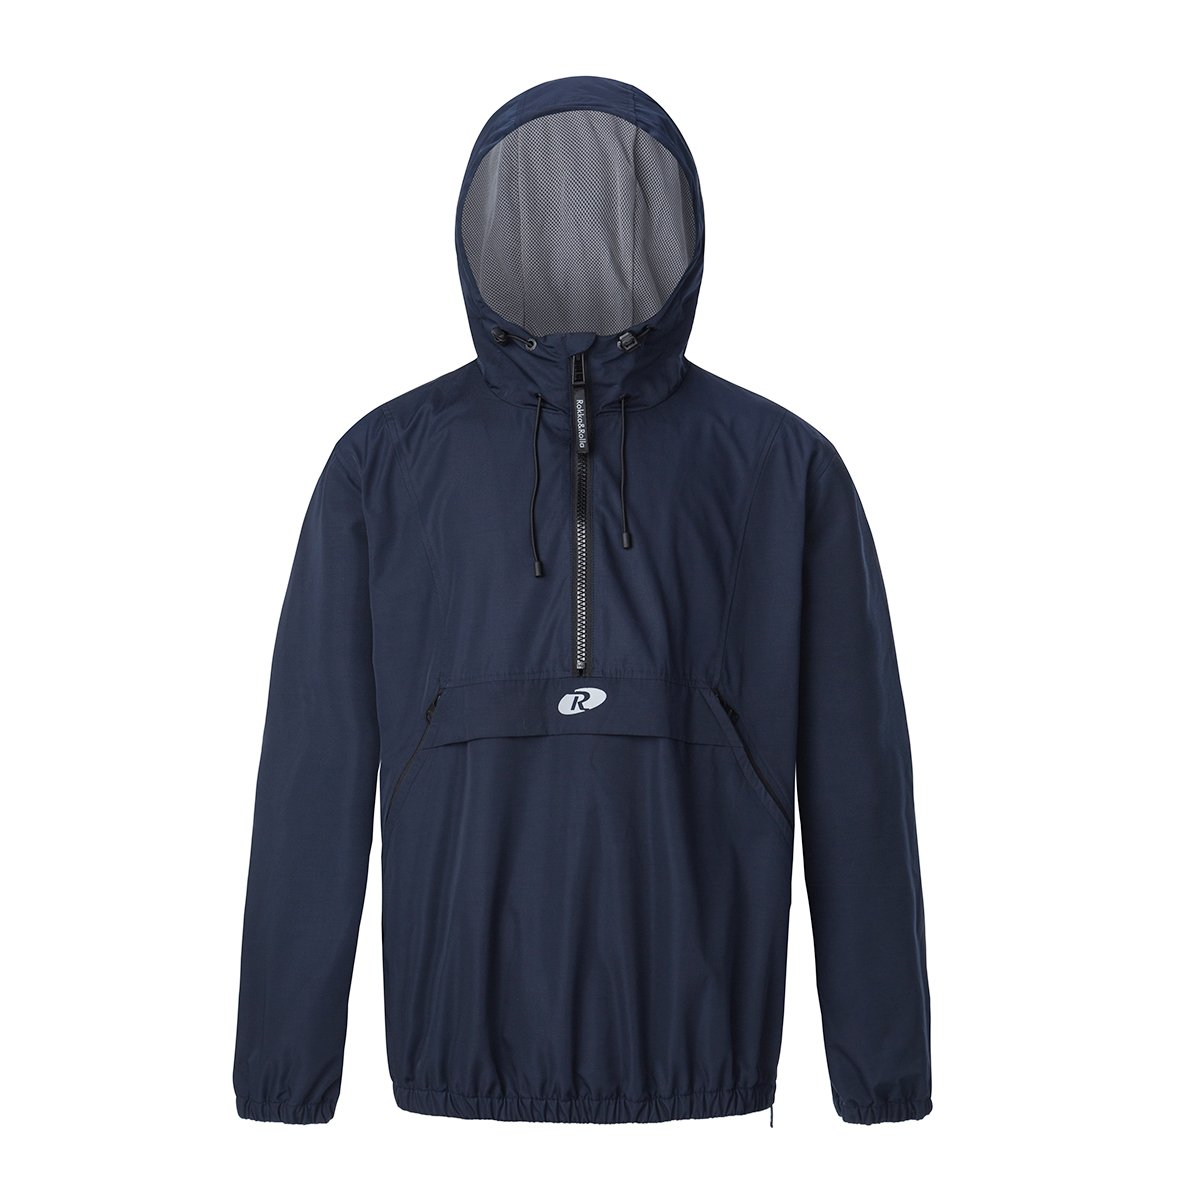 Rokka&Rolla Men's Athletic Water-Resistant Hooded Windbreaker Pullover Anorak Cycling Running Jacket